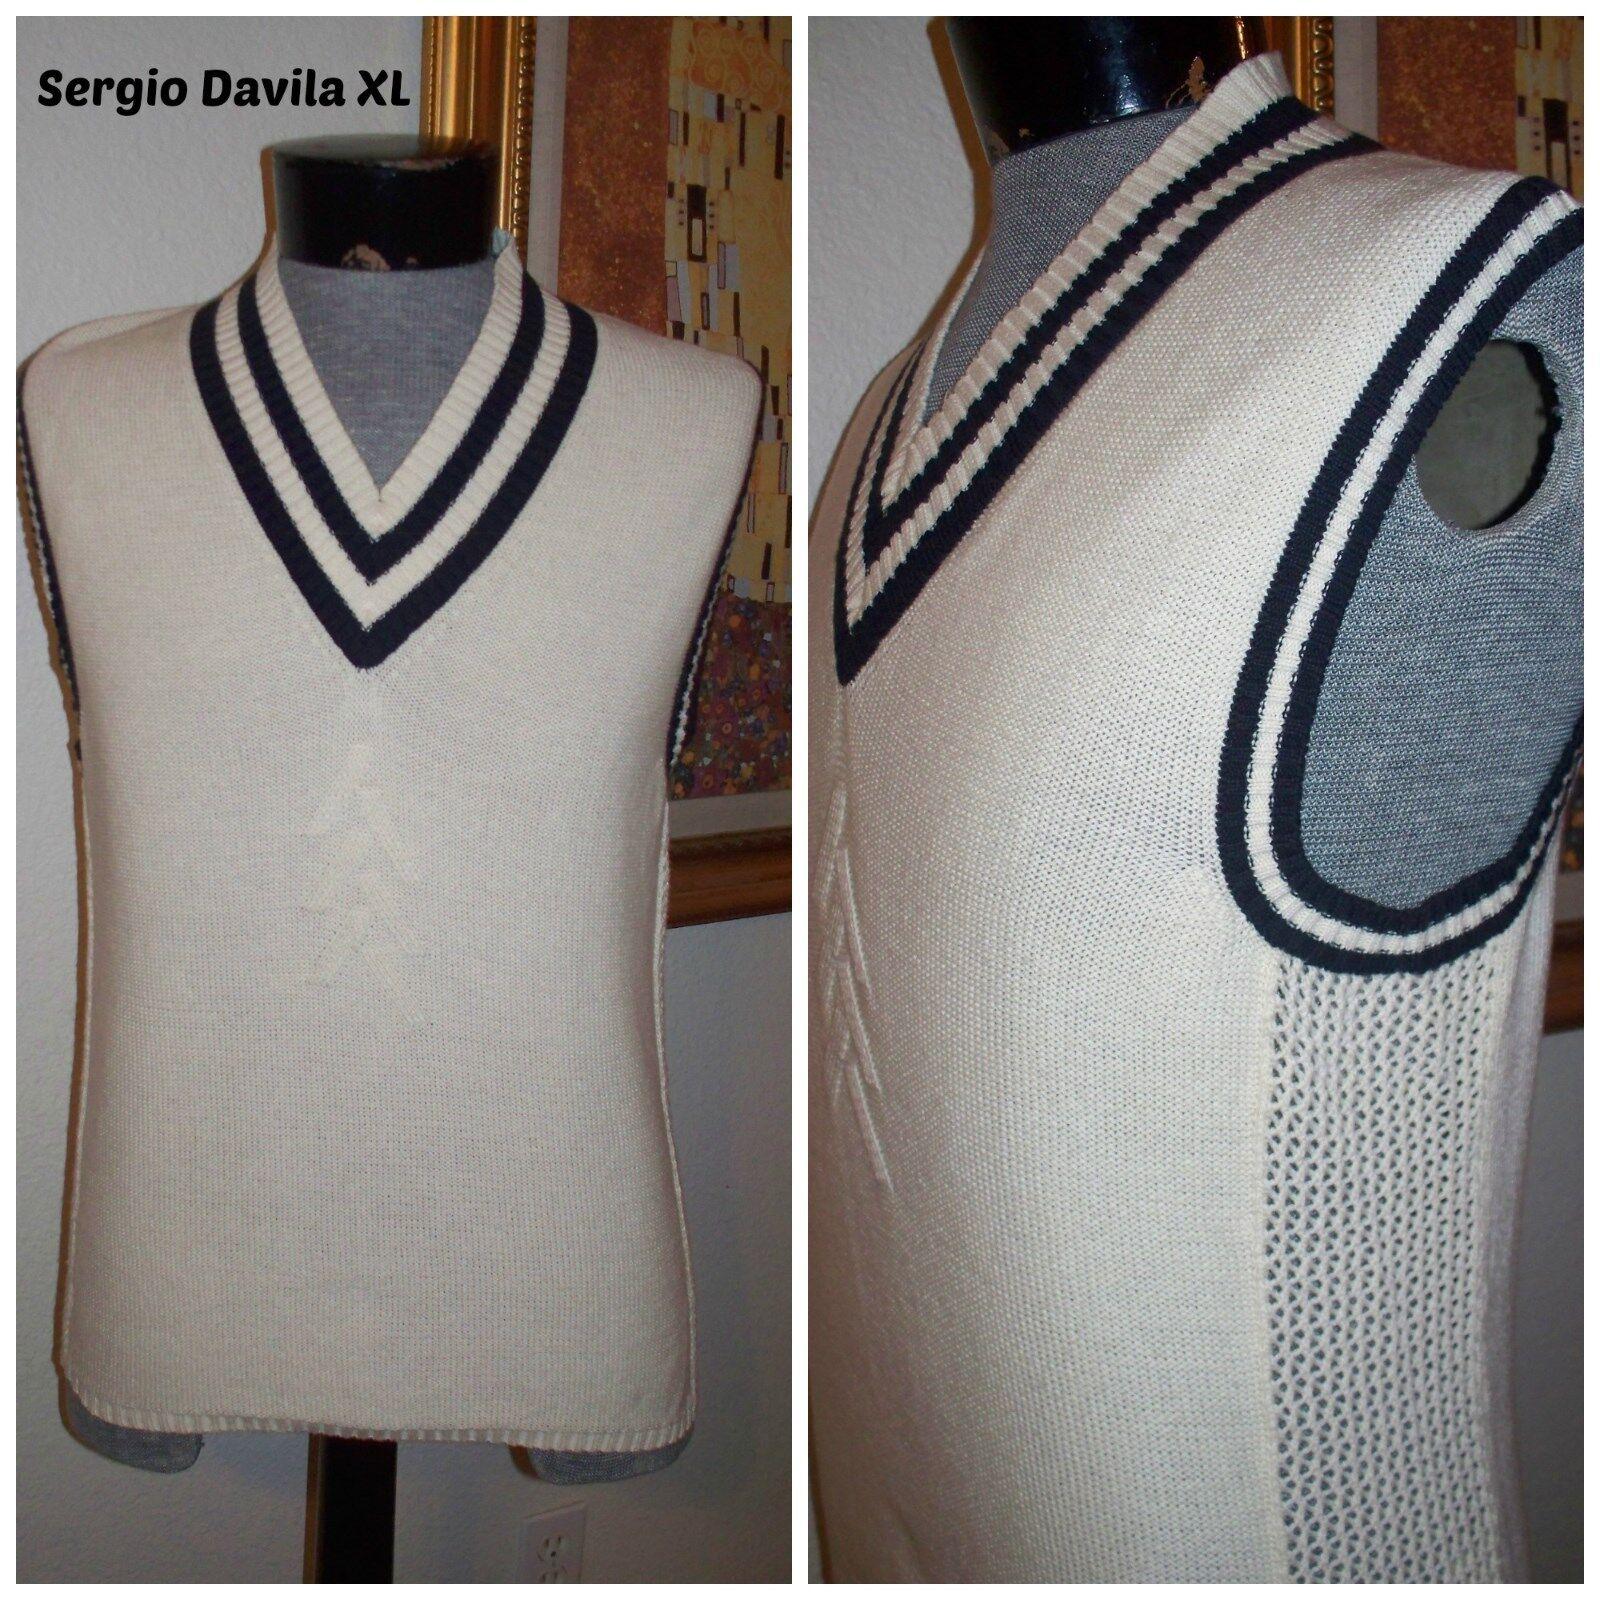 Mens   Sergio Davila   2 Tone Farbeblock Designer Intricate Knit Sweater Vest XL